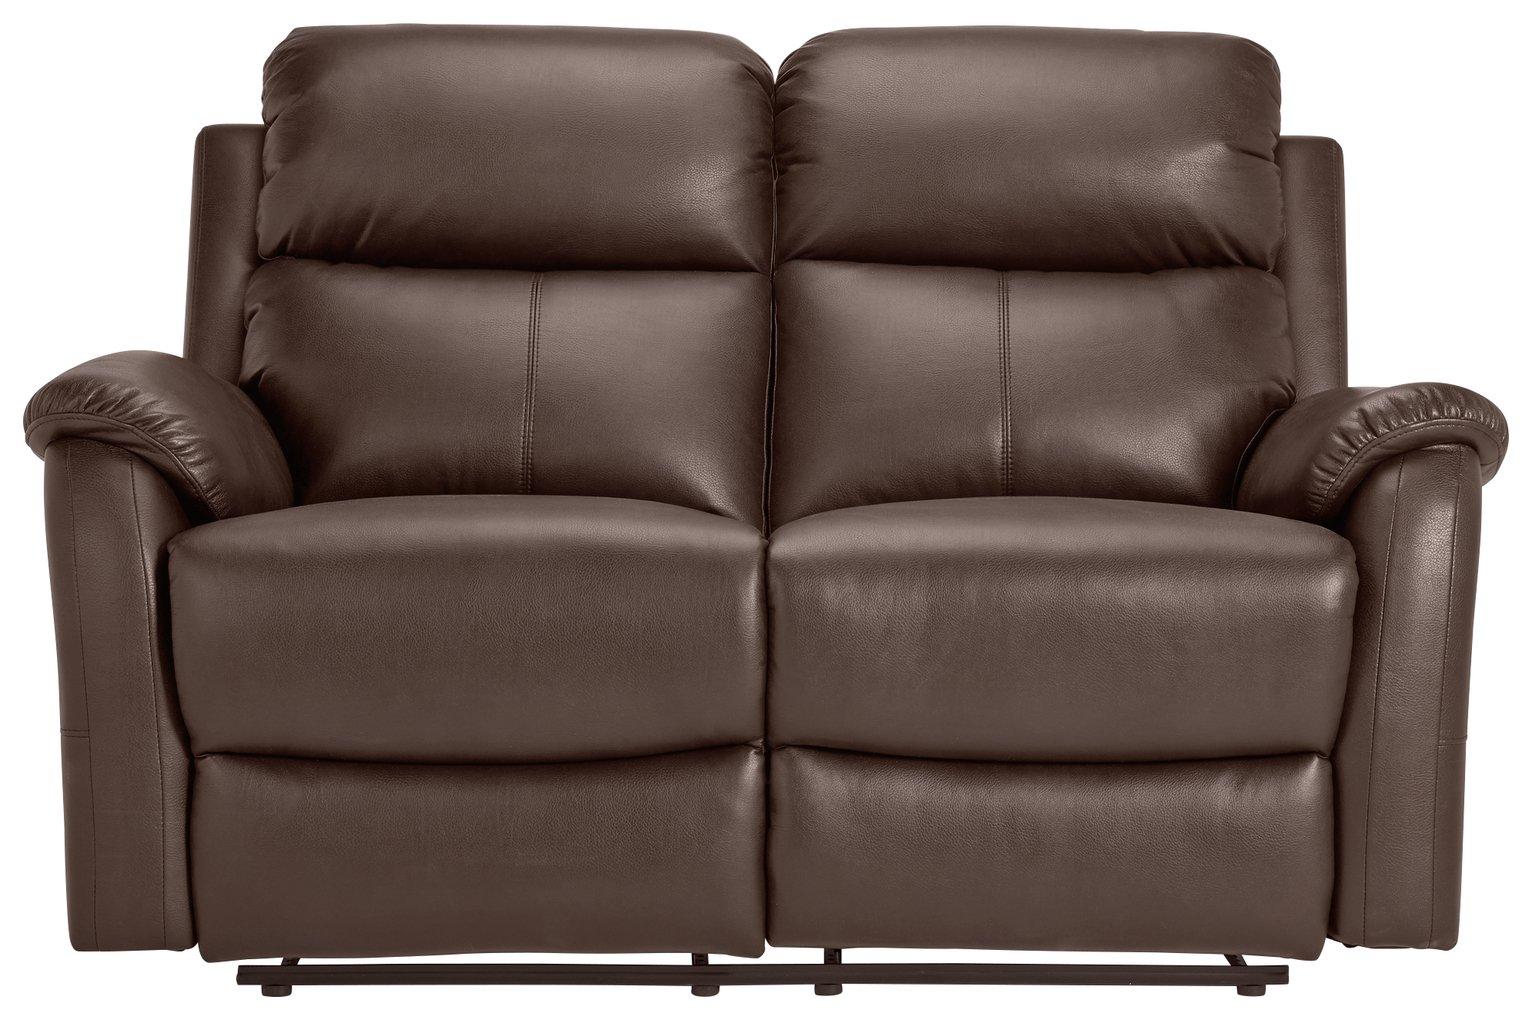 distressed leather corner sofa uk sofas sydney designer results for recliner argos home tyler 2 seater chocolate